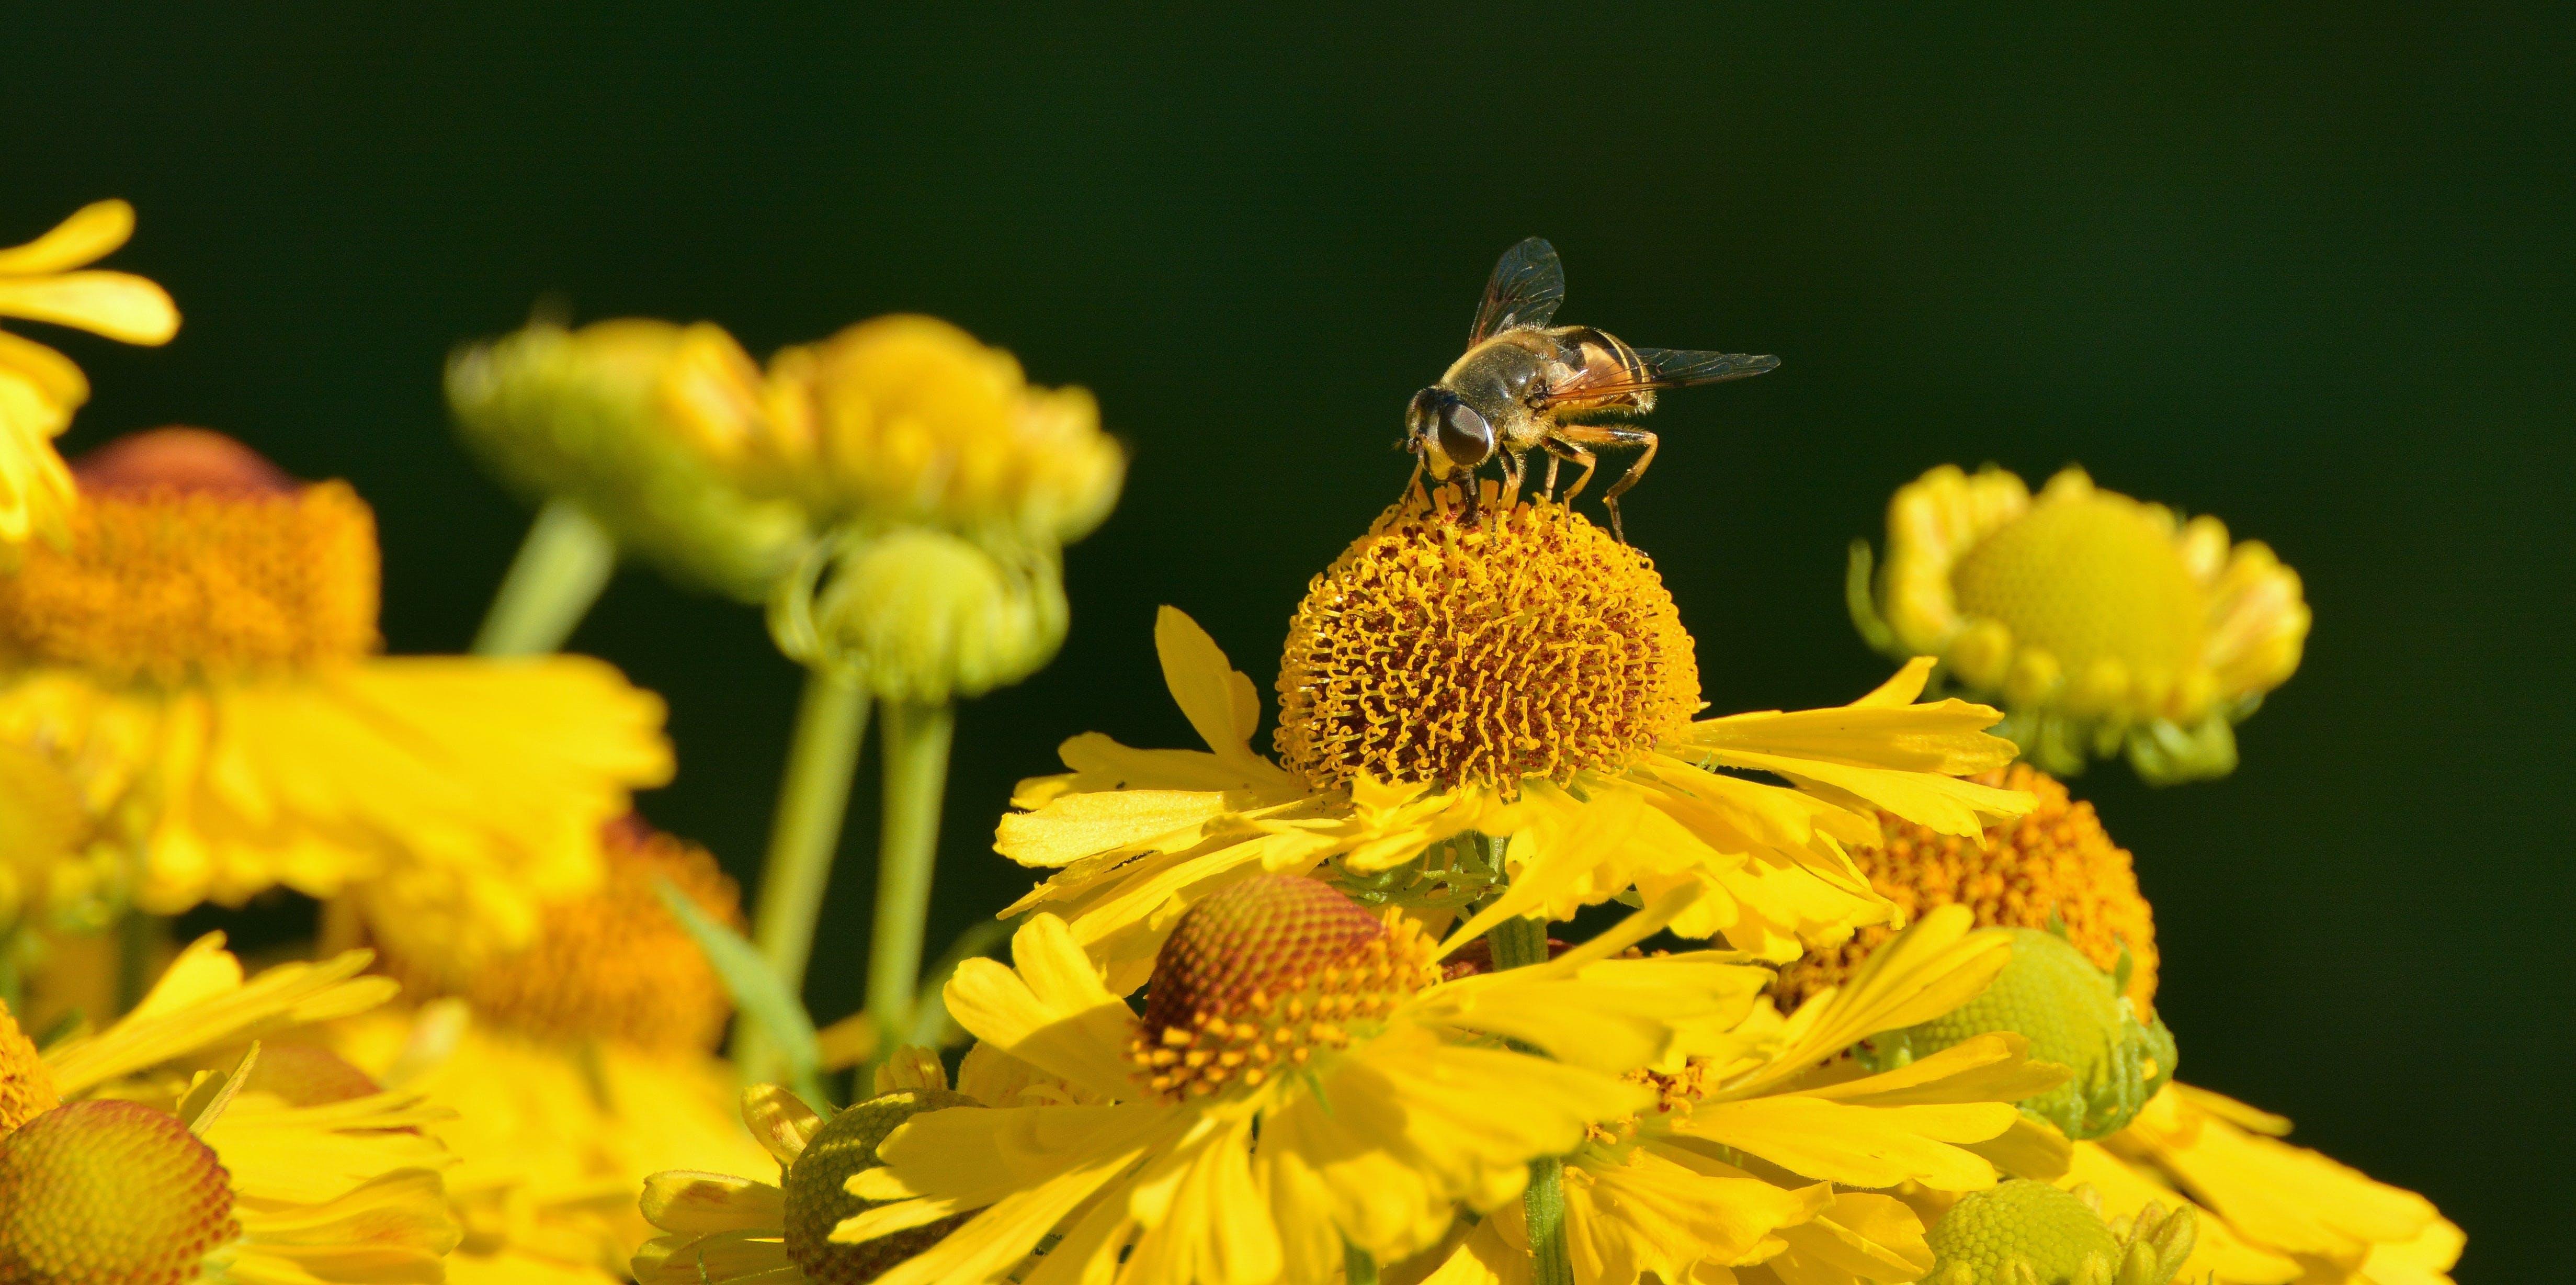 Yellow Honeybee on Yellow Petal Flower